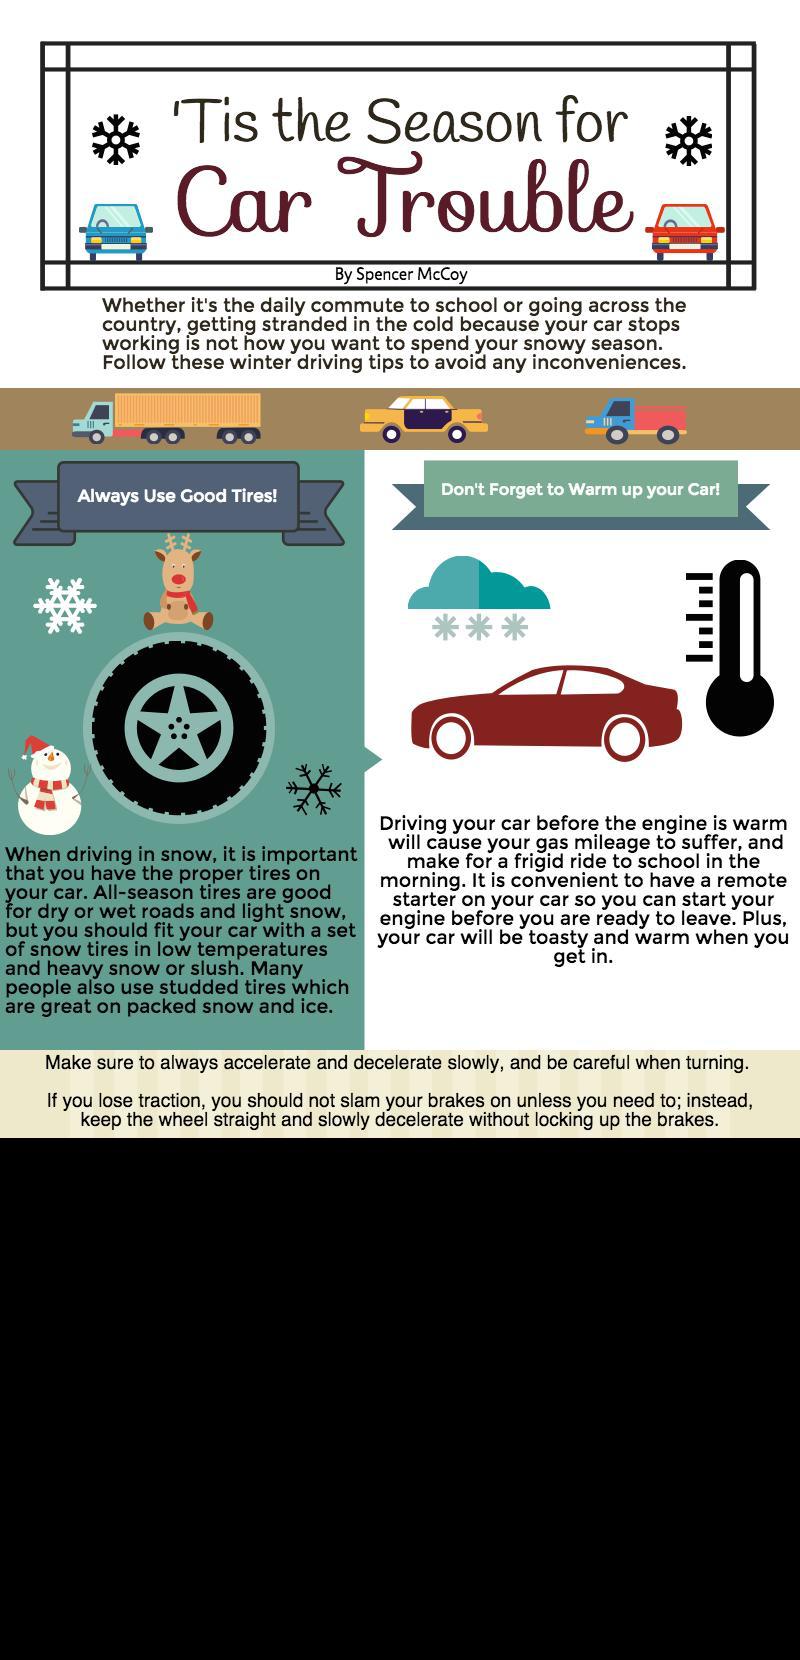 'Tis the Season for Car Trouble